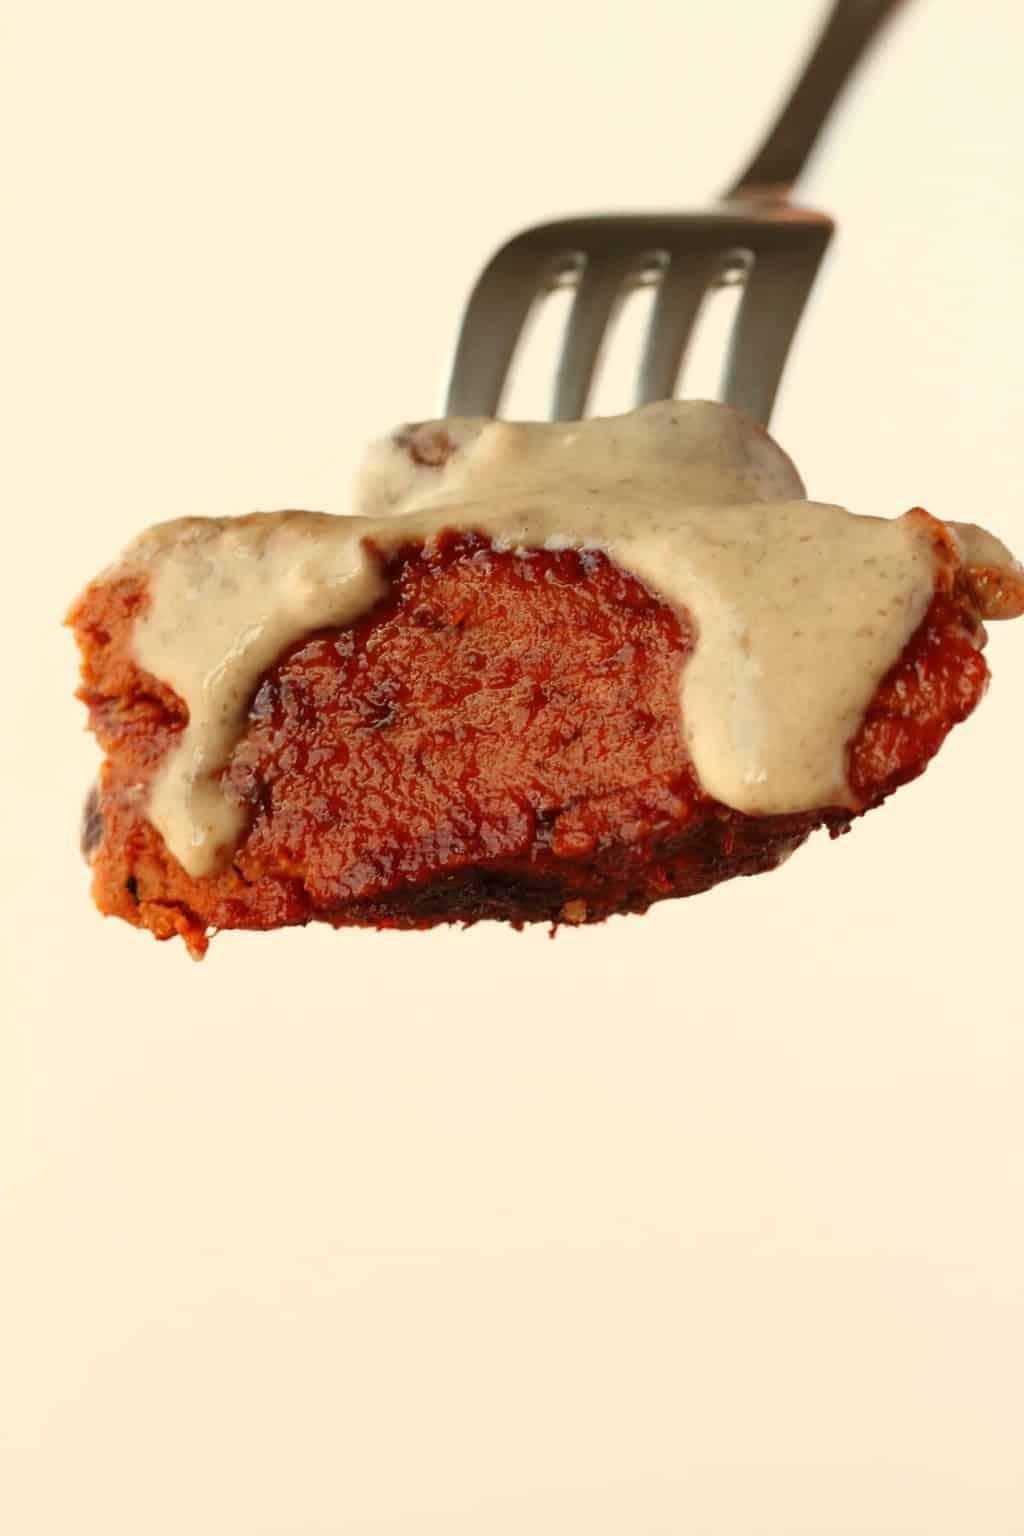 c0e0cf2f664b A forkful of vegan steak covered in mushroom sauce.